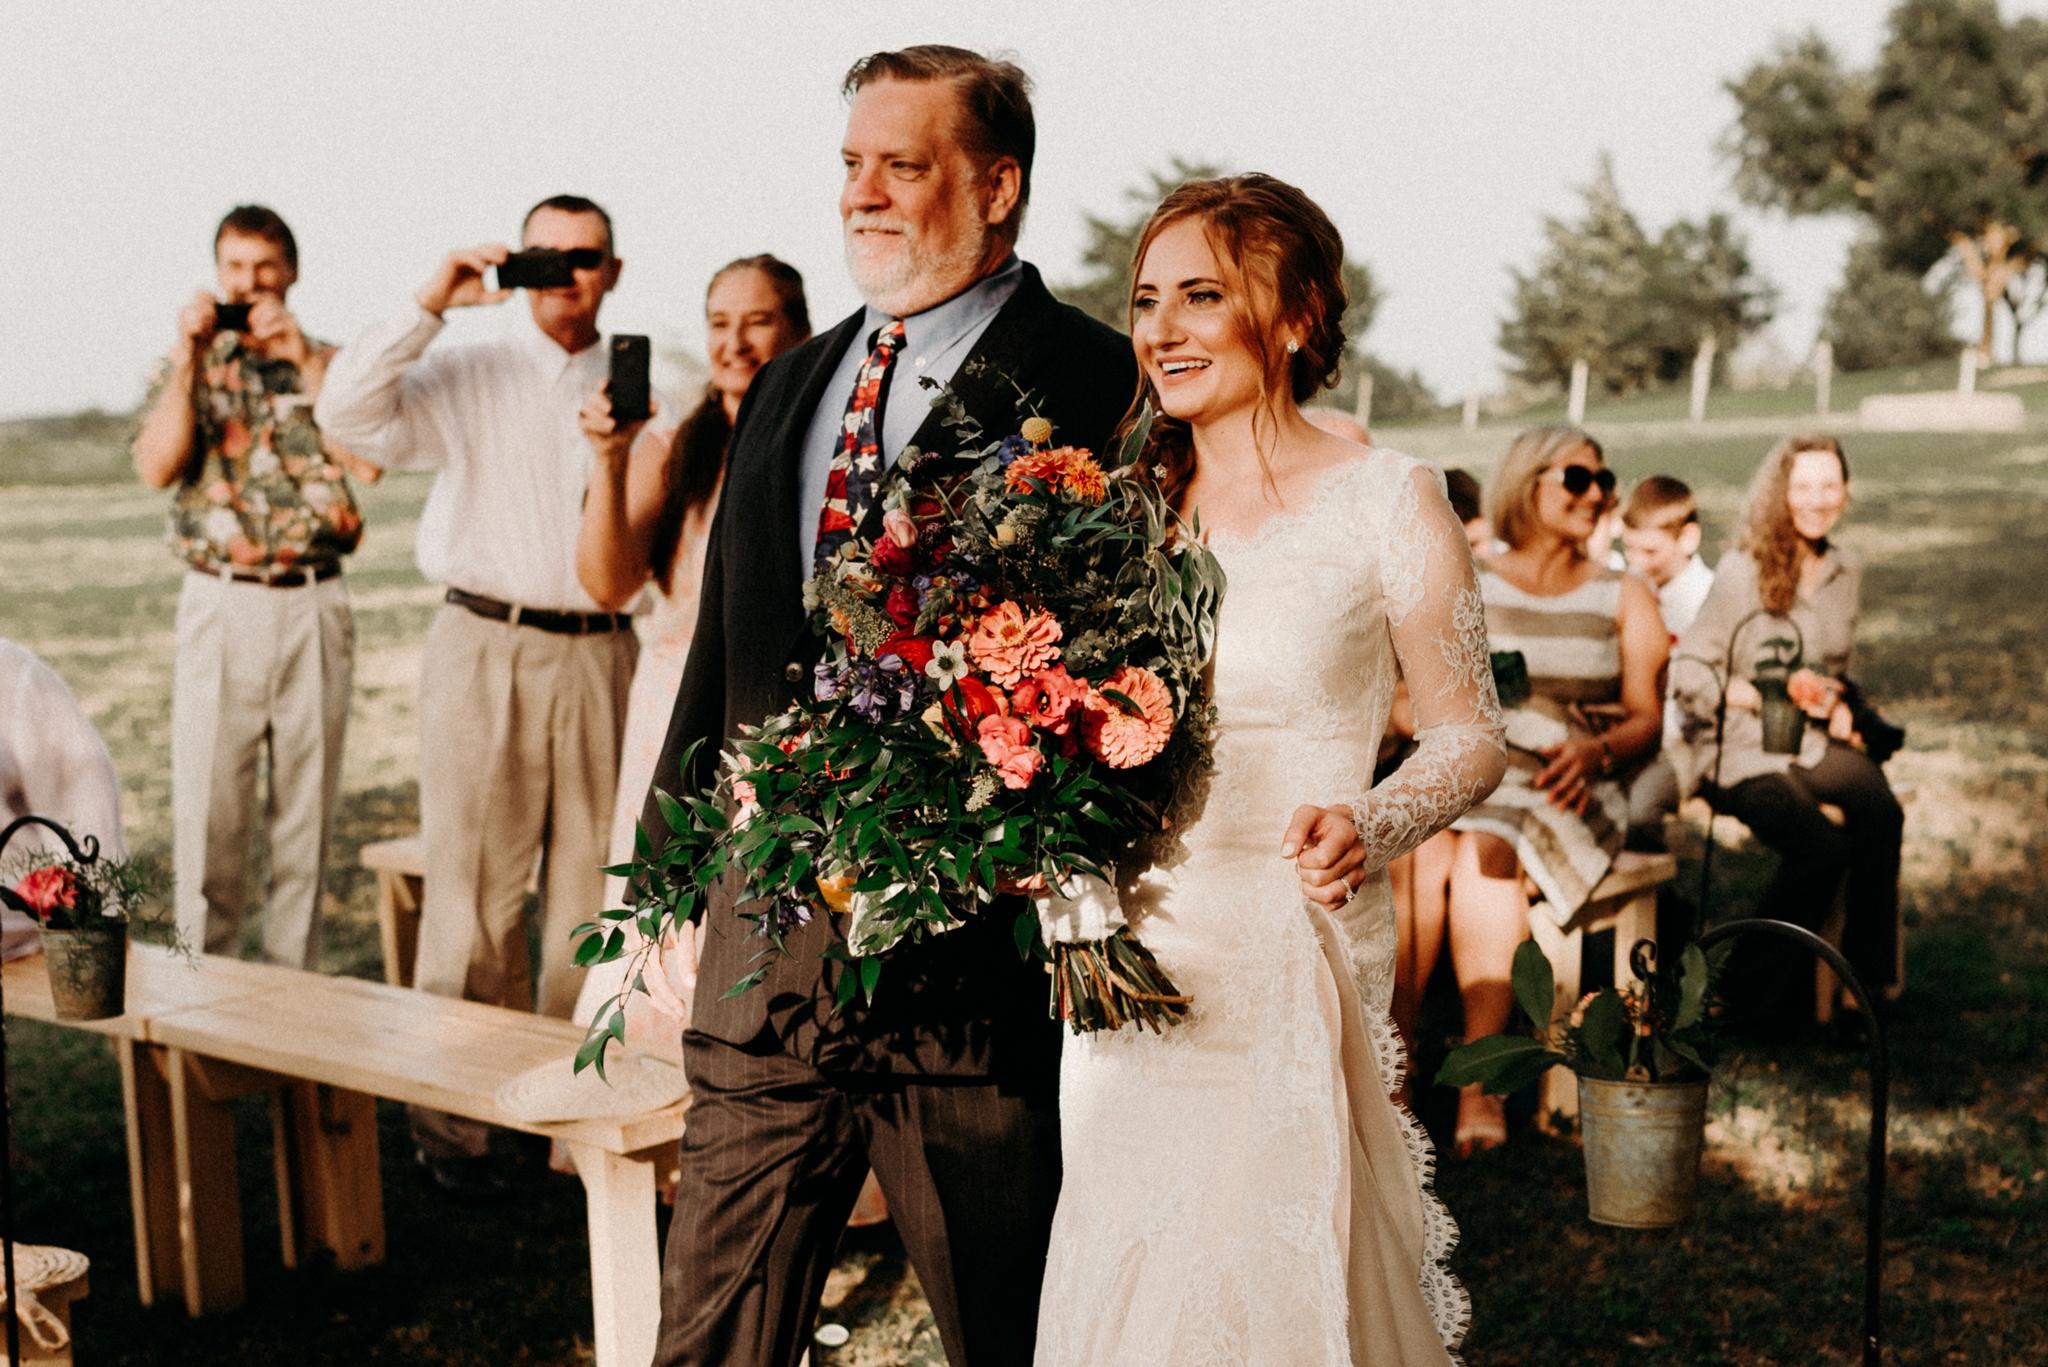 cottages-on-mill-creek-bohemian-floral-greenery-lakeside-intimate-houston-wedding-kerlyn-van-gelder-photography-wedding-photographer